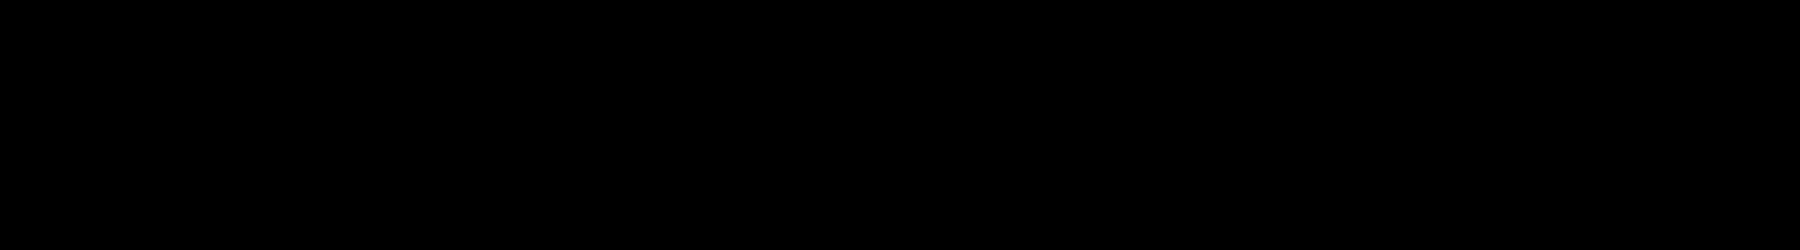 08-oriens.jpg